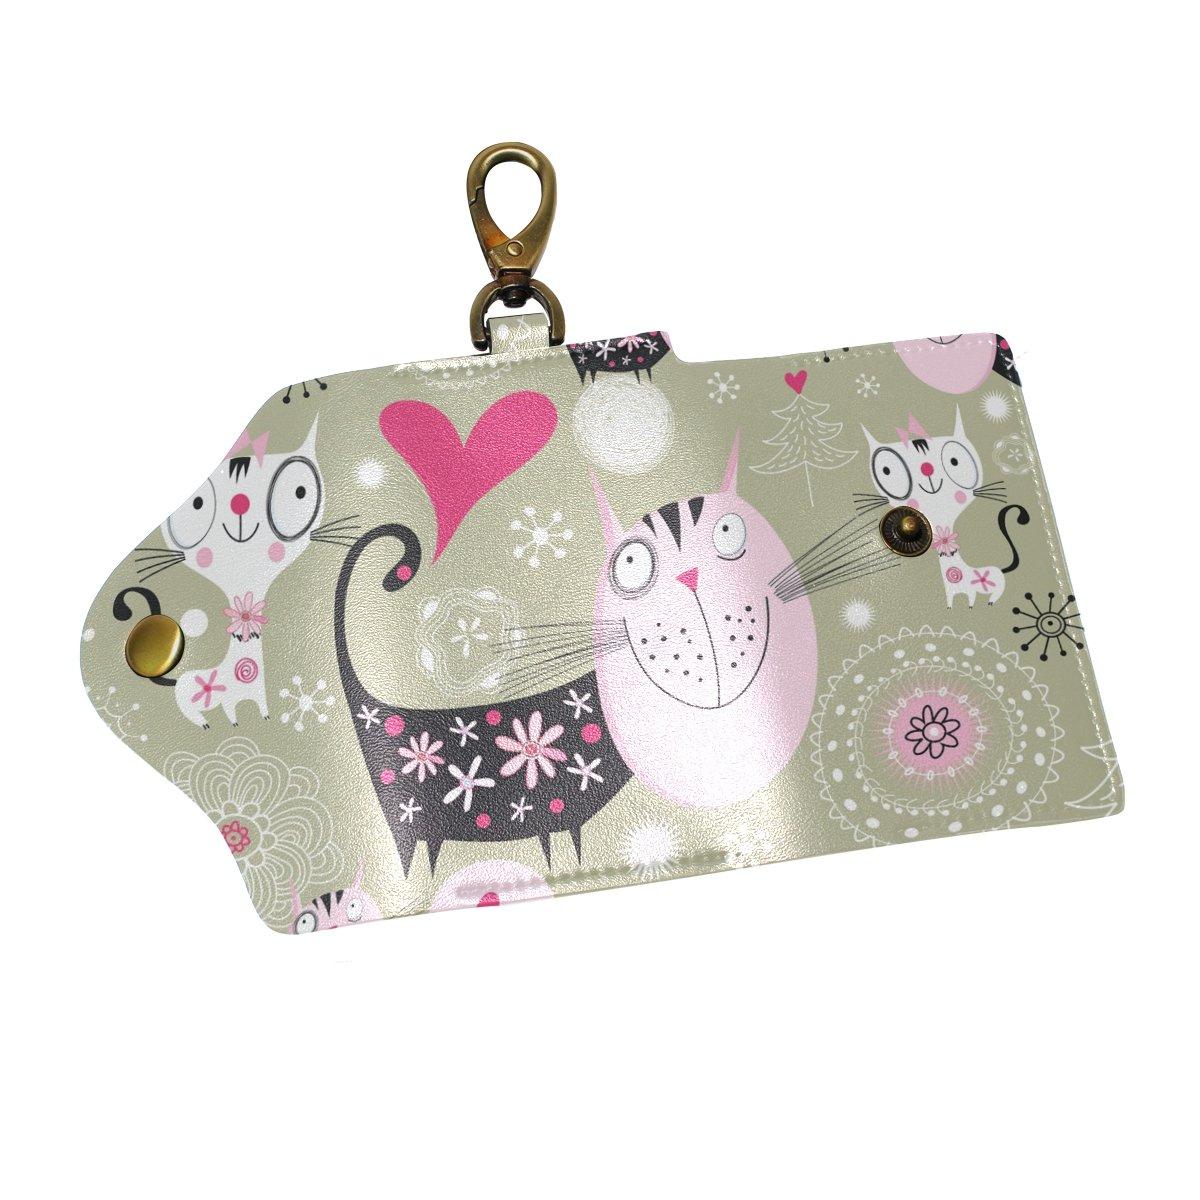 DEYYA Cute Cats Colorful Leather Key Case Wallets Unisex Keychain Key Holder with 6 Hooks Snap Closure